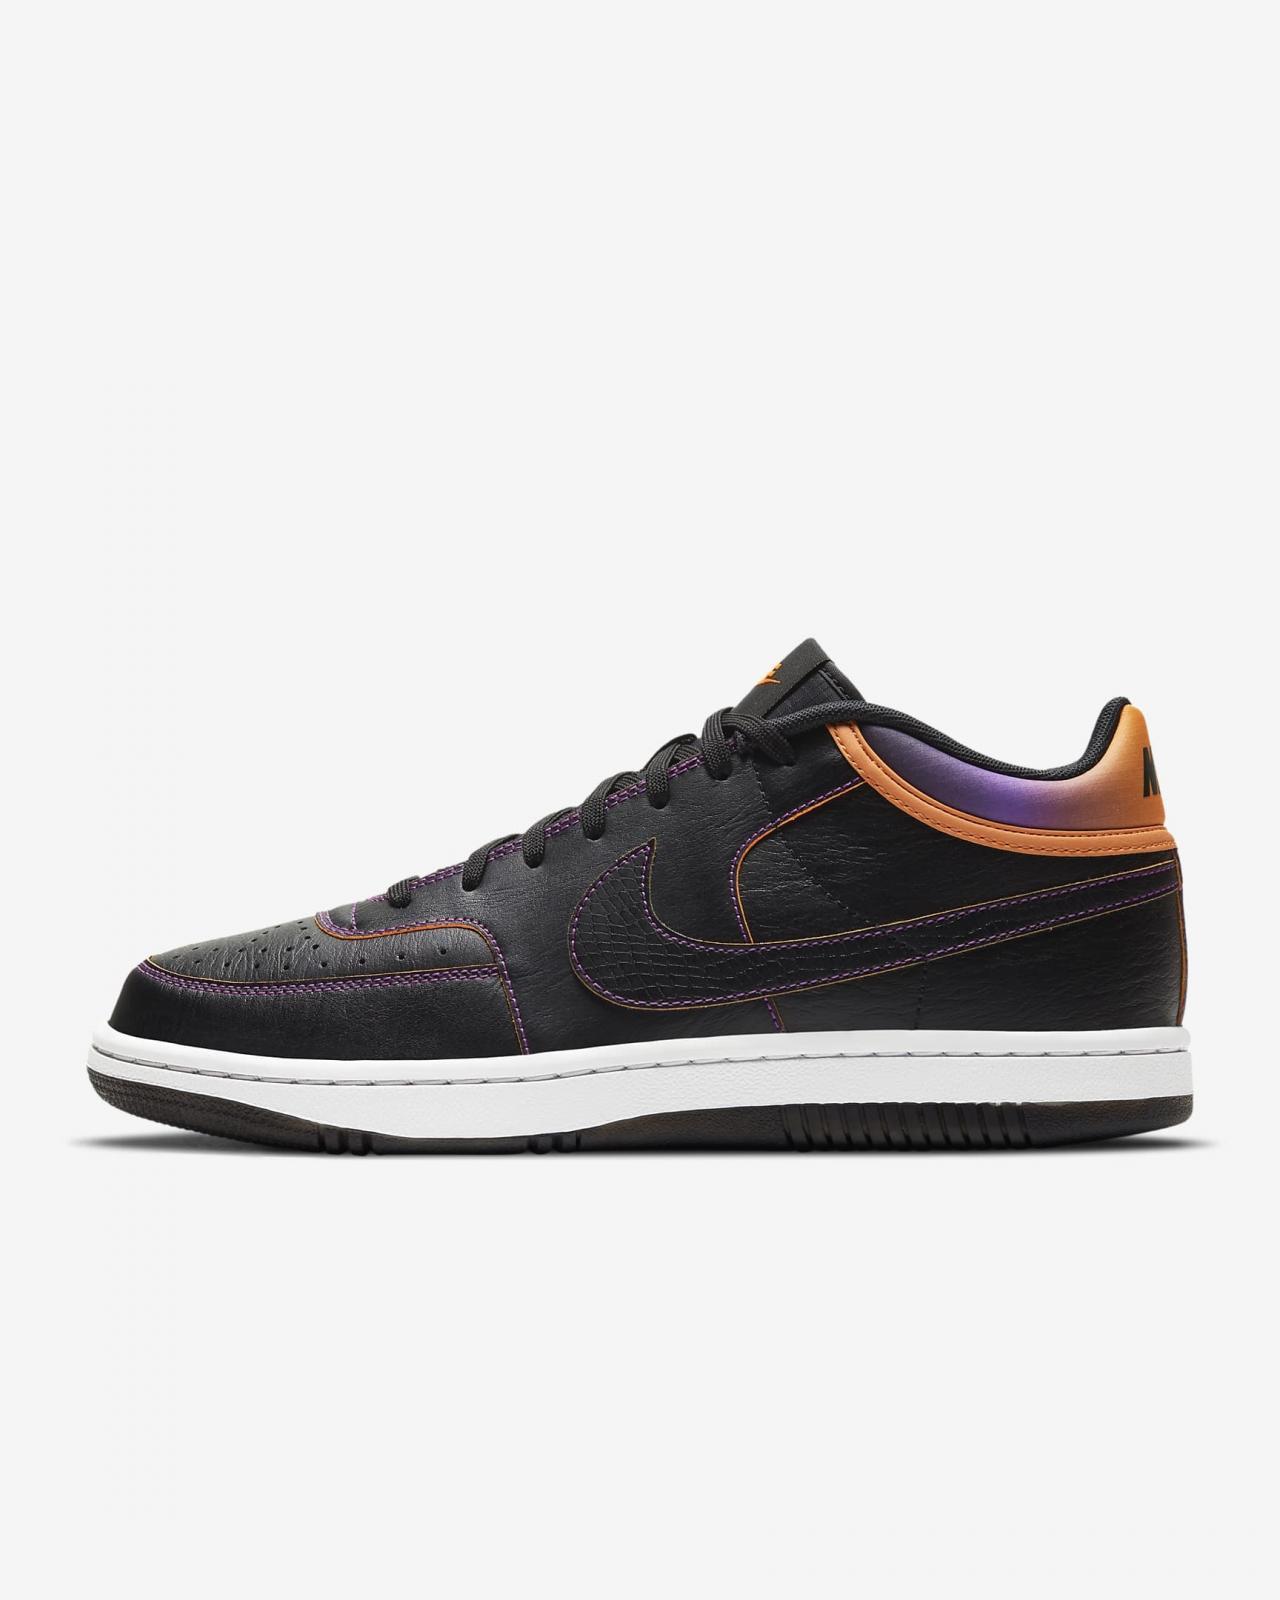 Nike Sportswear推出全新黑/明亮紫/白/荷兰橙色Sky Force 3/4